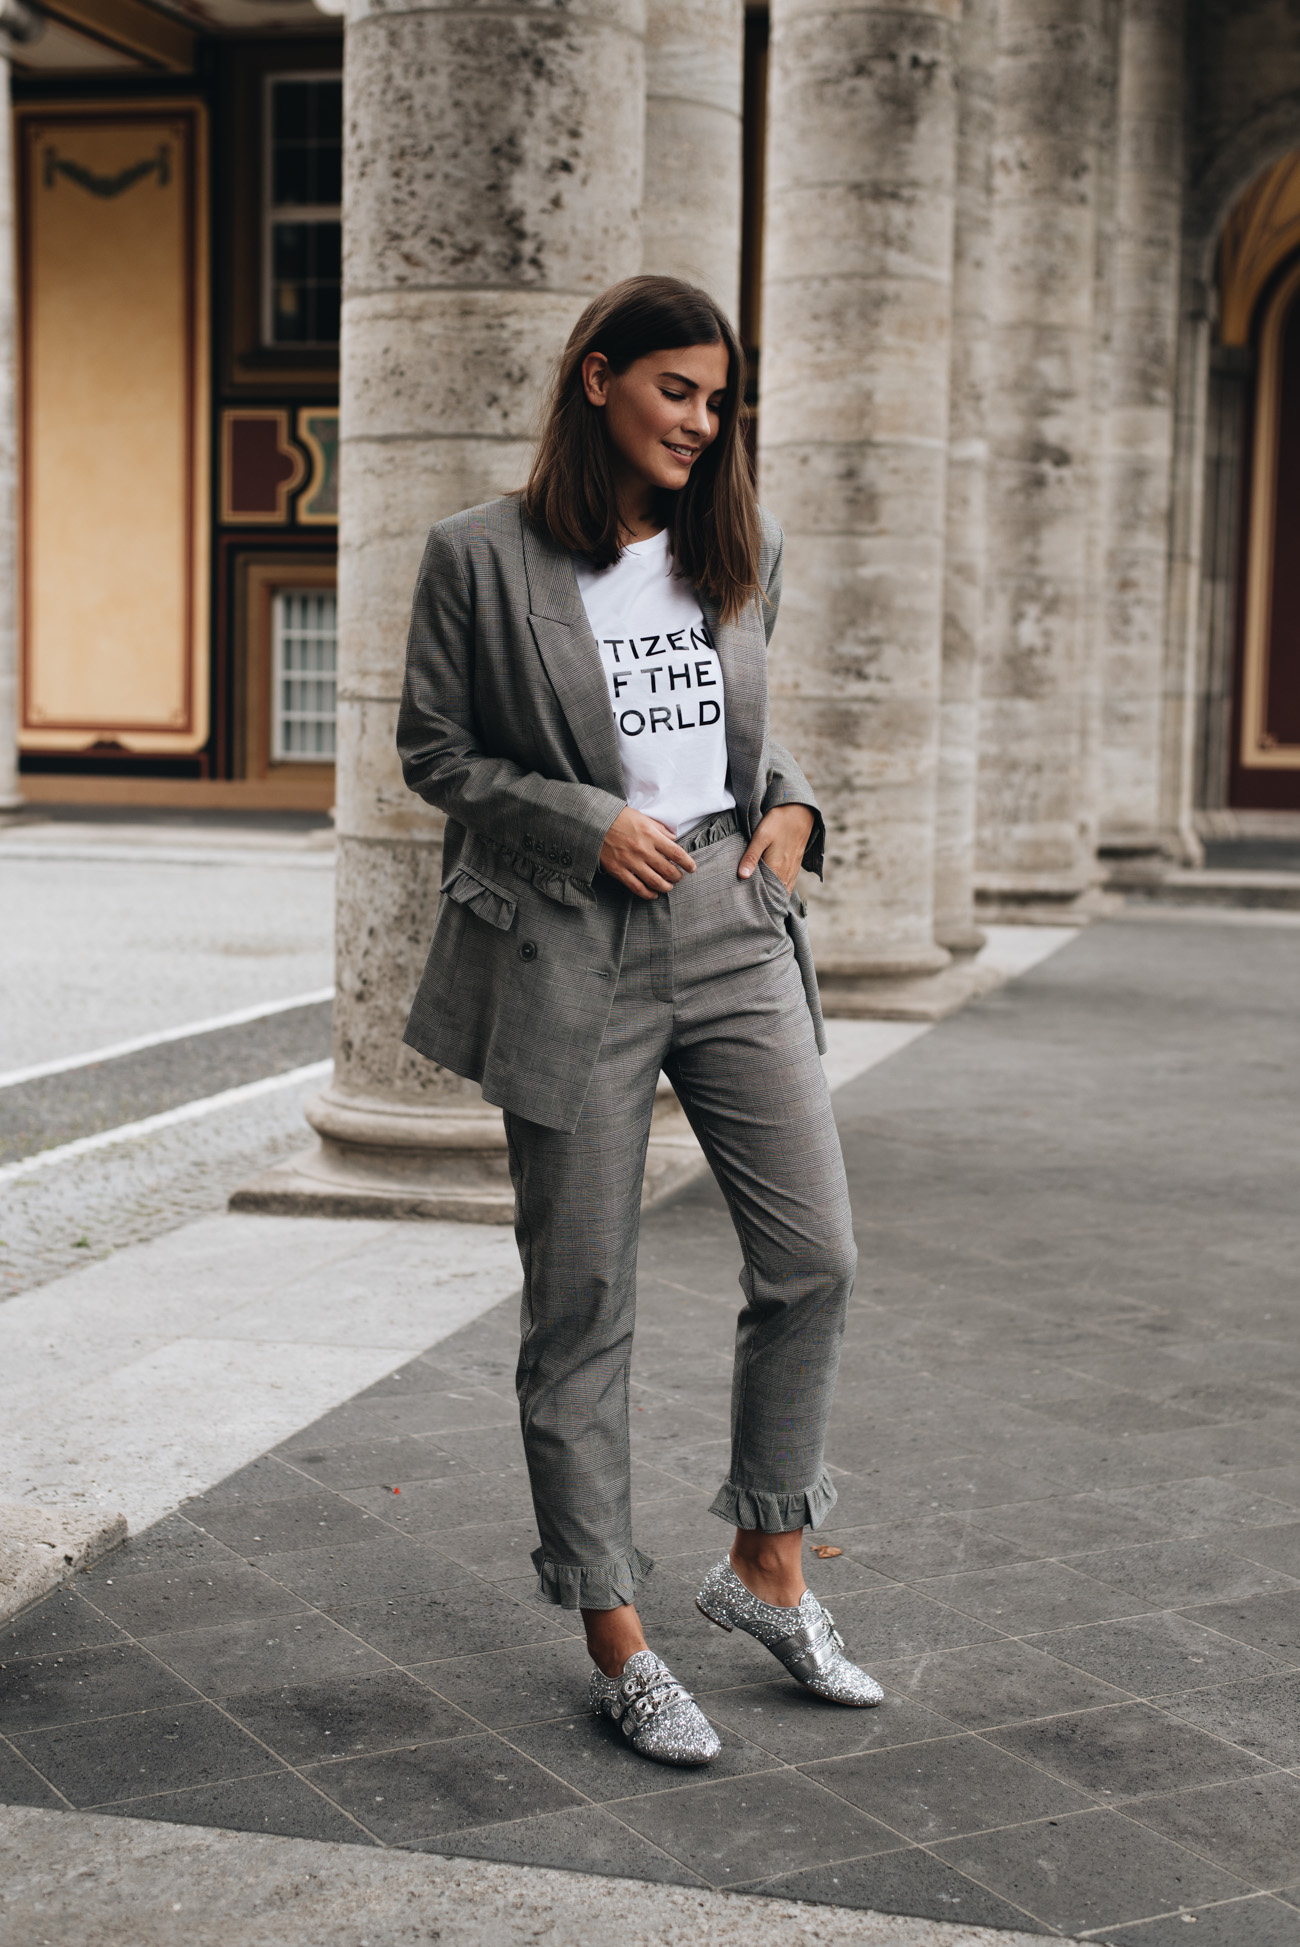 Dresscode-Guide: Welche Kleidung gehört zu welchem Anlass?